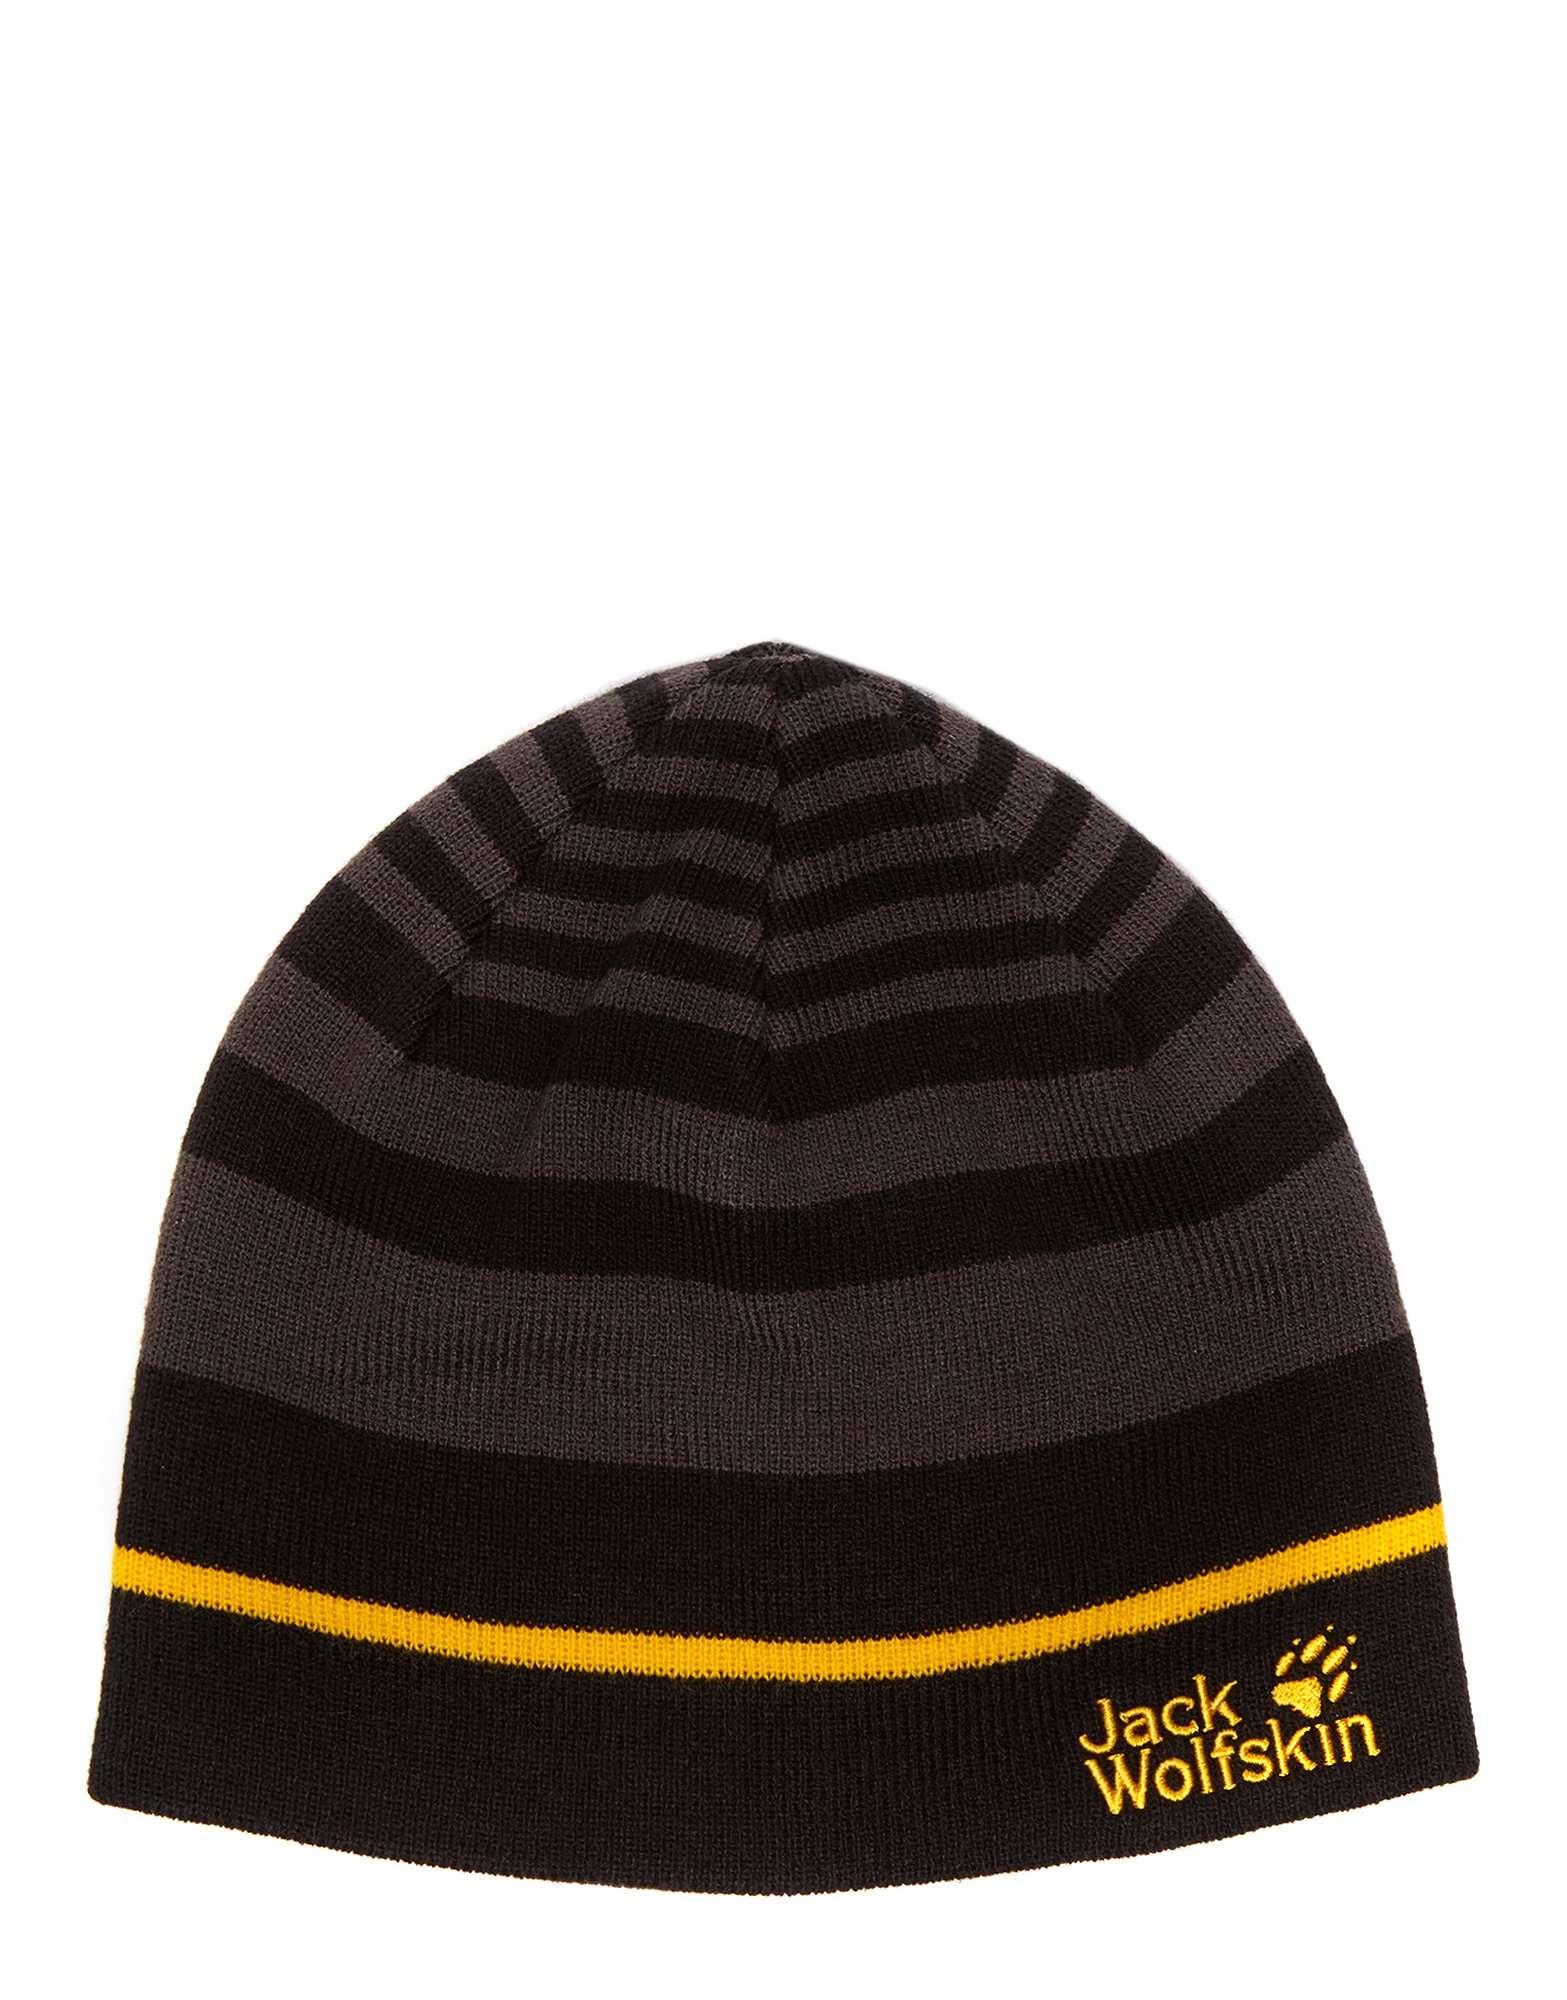 JACK WOLFSKIN Horizon Cap